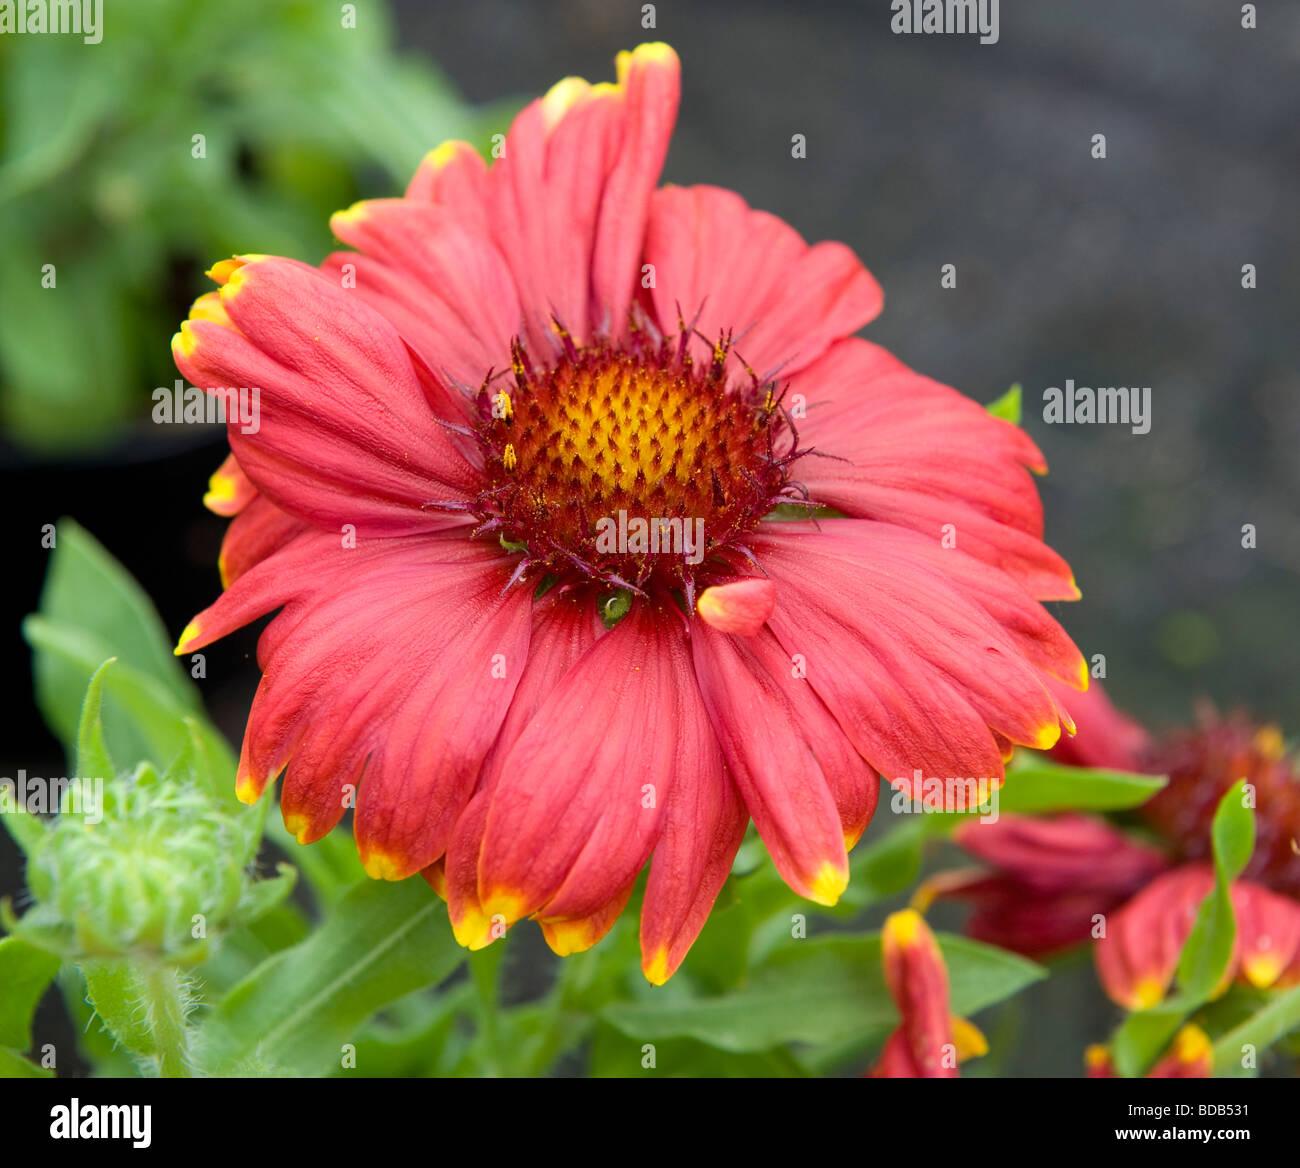 Gaillardia Sunburst Red With Yellow Tip A Bright Red Flower Daisy